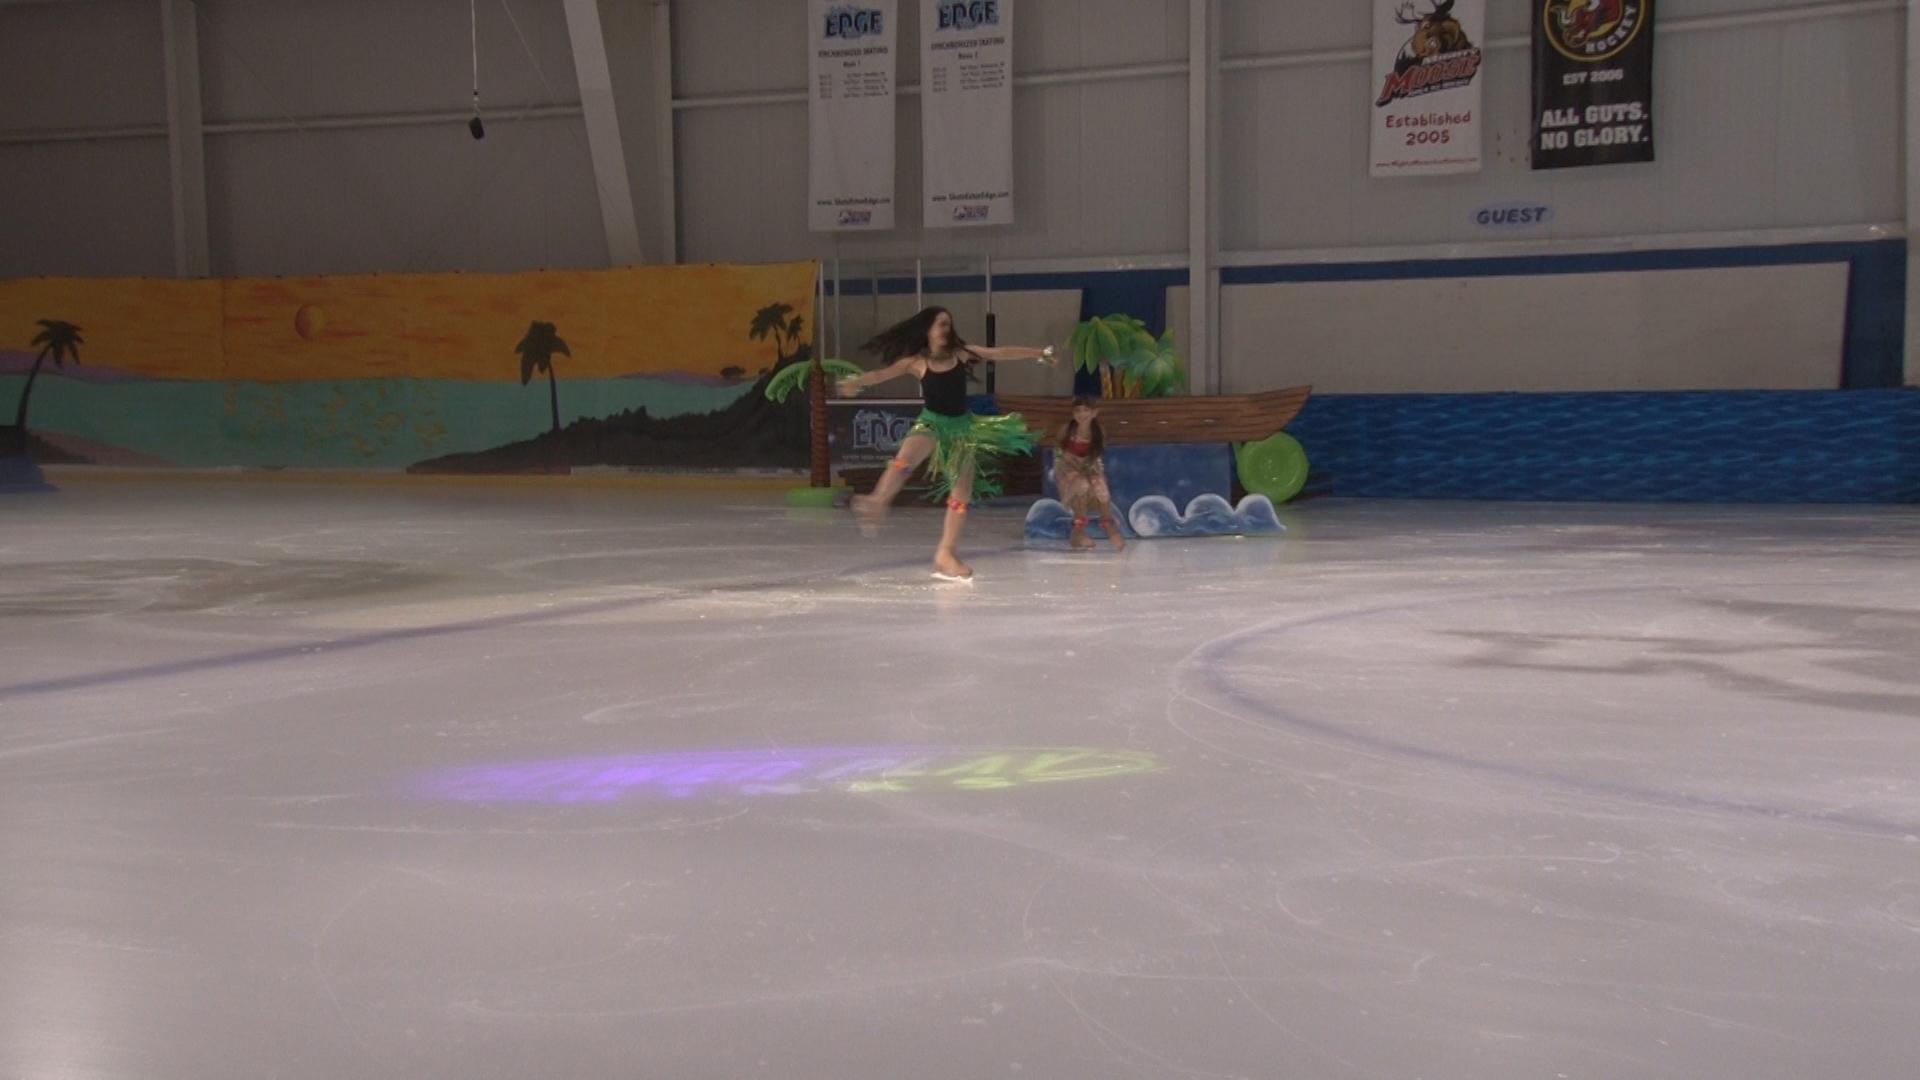 Power Play Maui Skate on Ice 071417.00_08_48_15.Still013.jpg